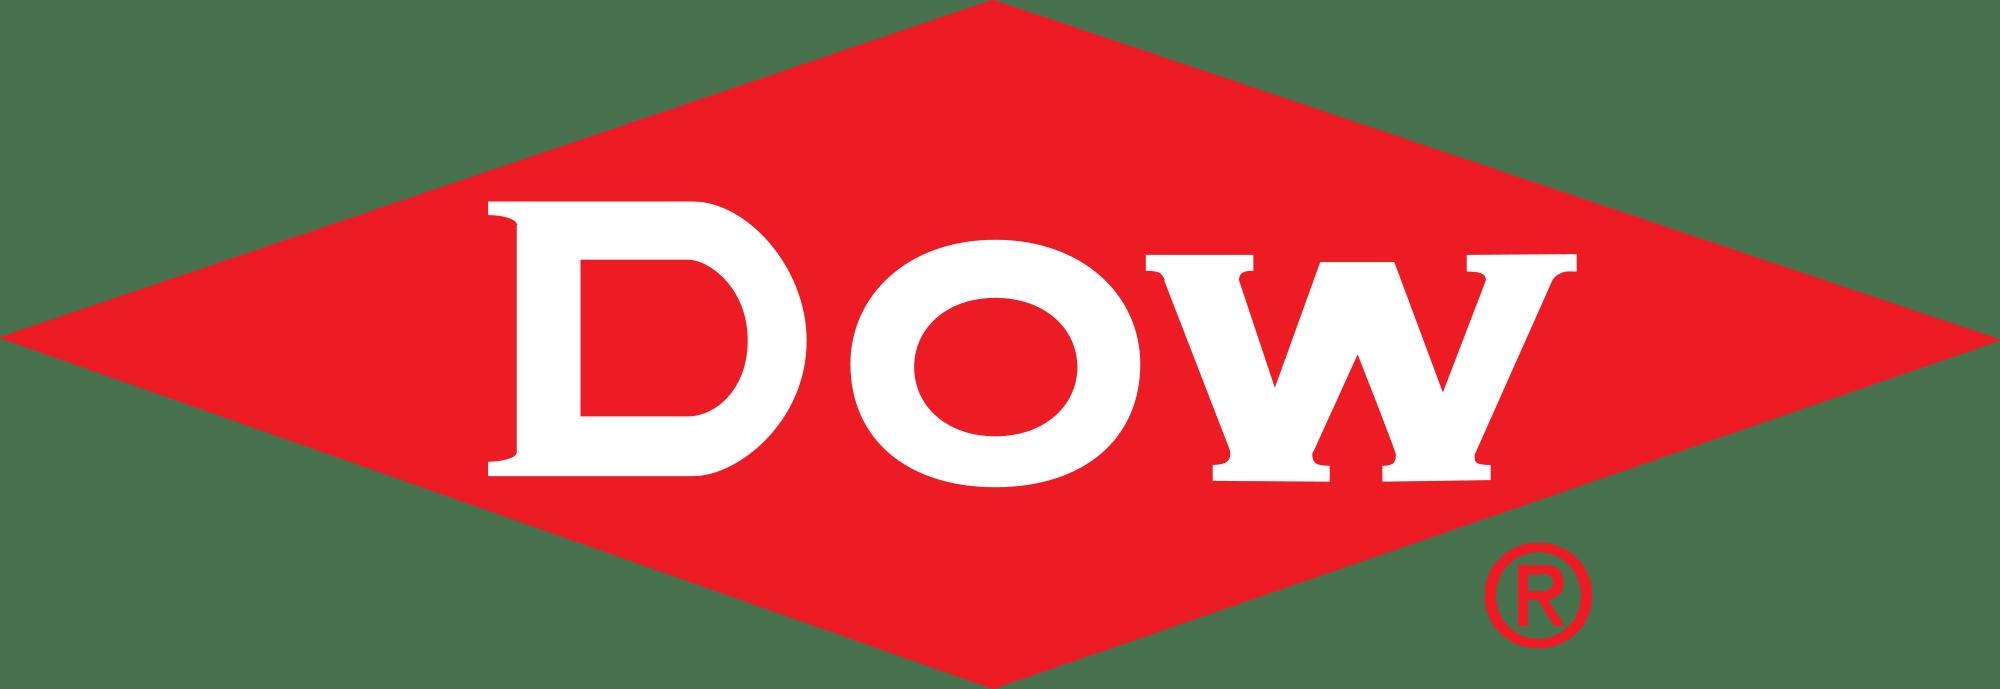 Boplan client: Dow Chemical logo